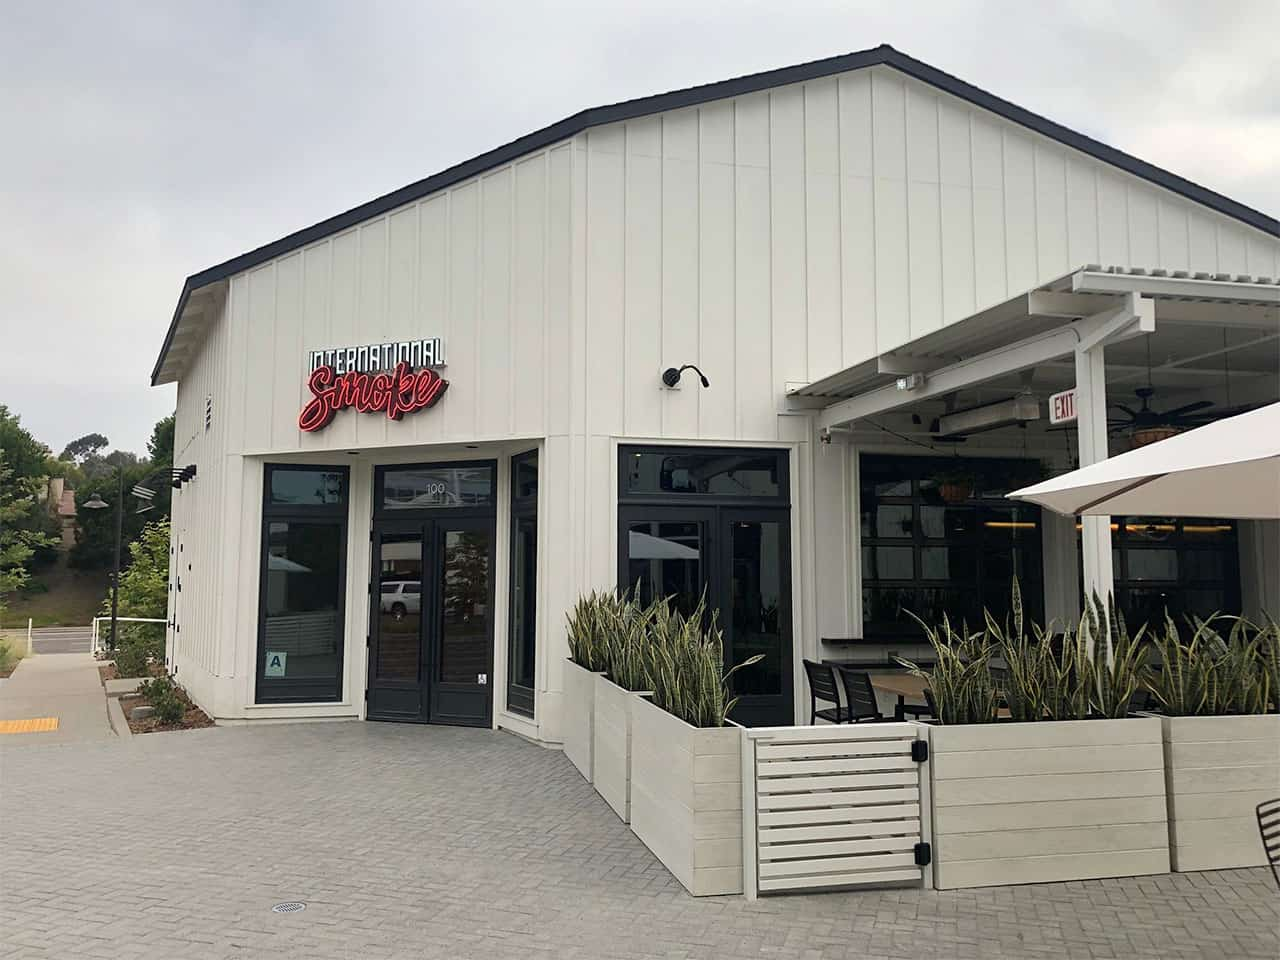 Swing Gates for Internation Smokehouse restaurant - Legend Fence